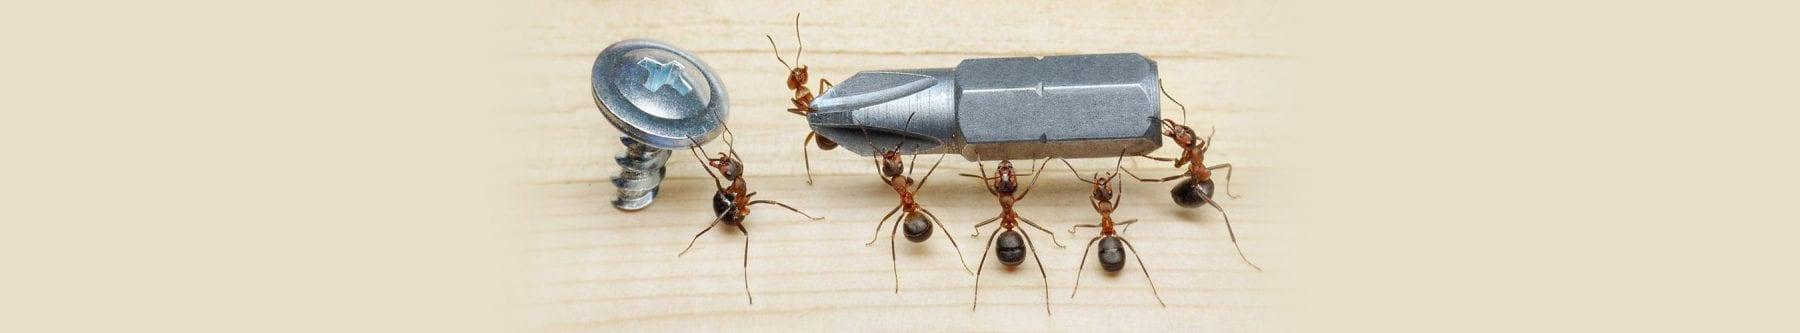 carpenter ant control Metro Vancouver, BC - Westside Pest Control